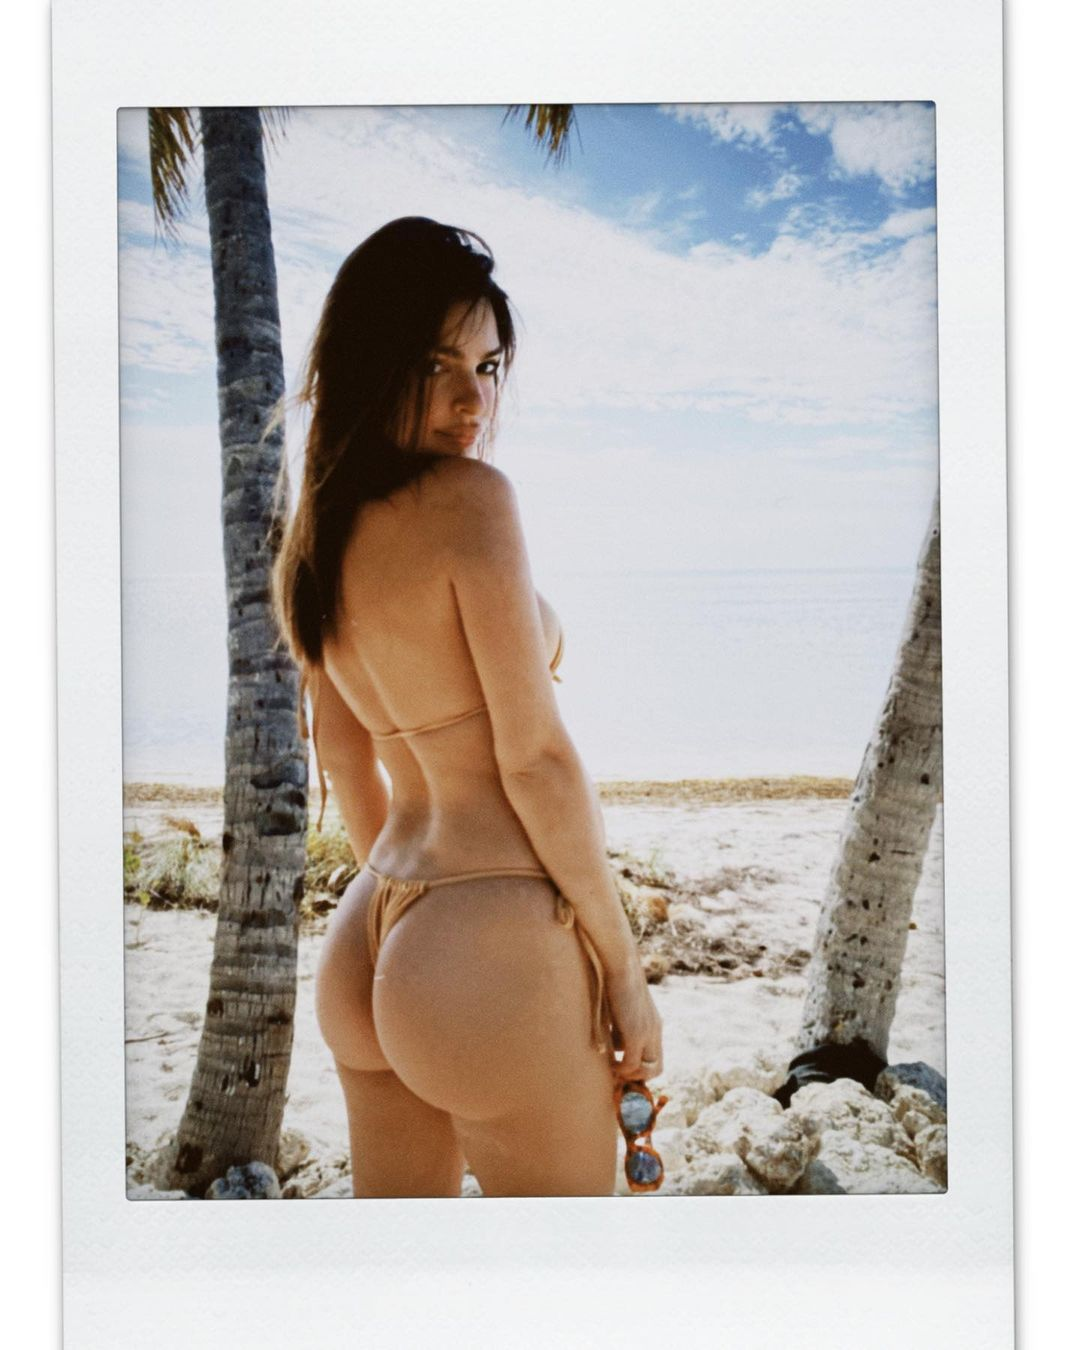 Emily Ratajkowski Big Ass In Thong Bikini